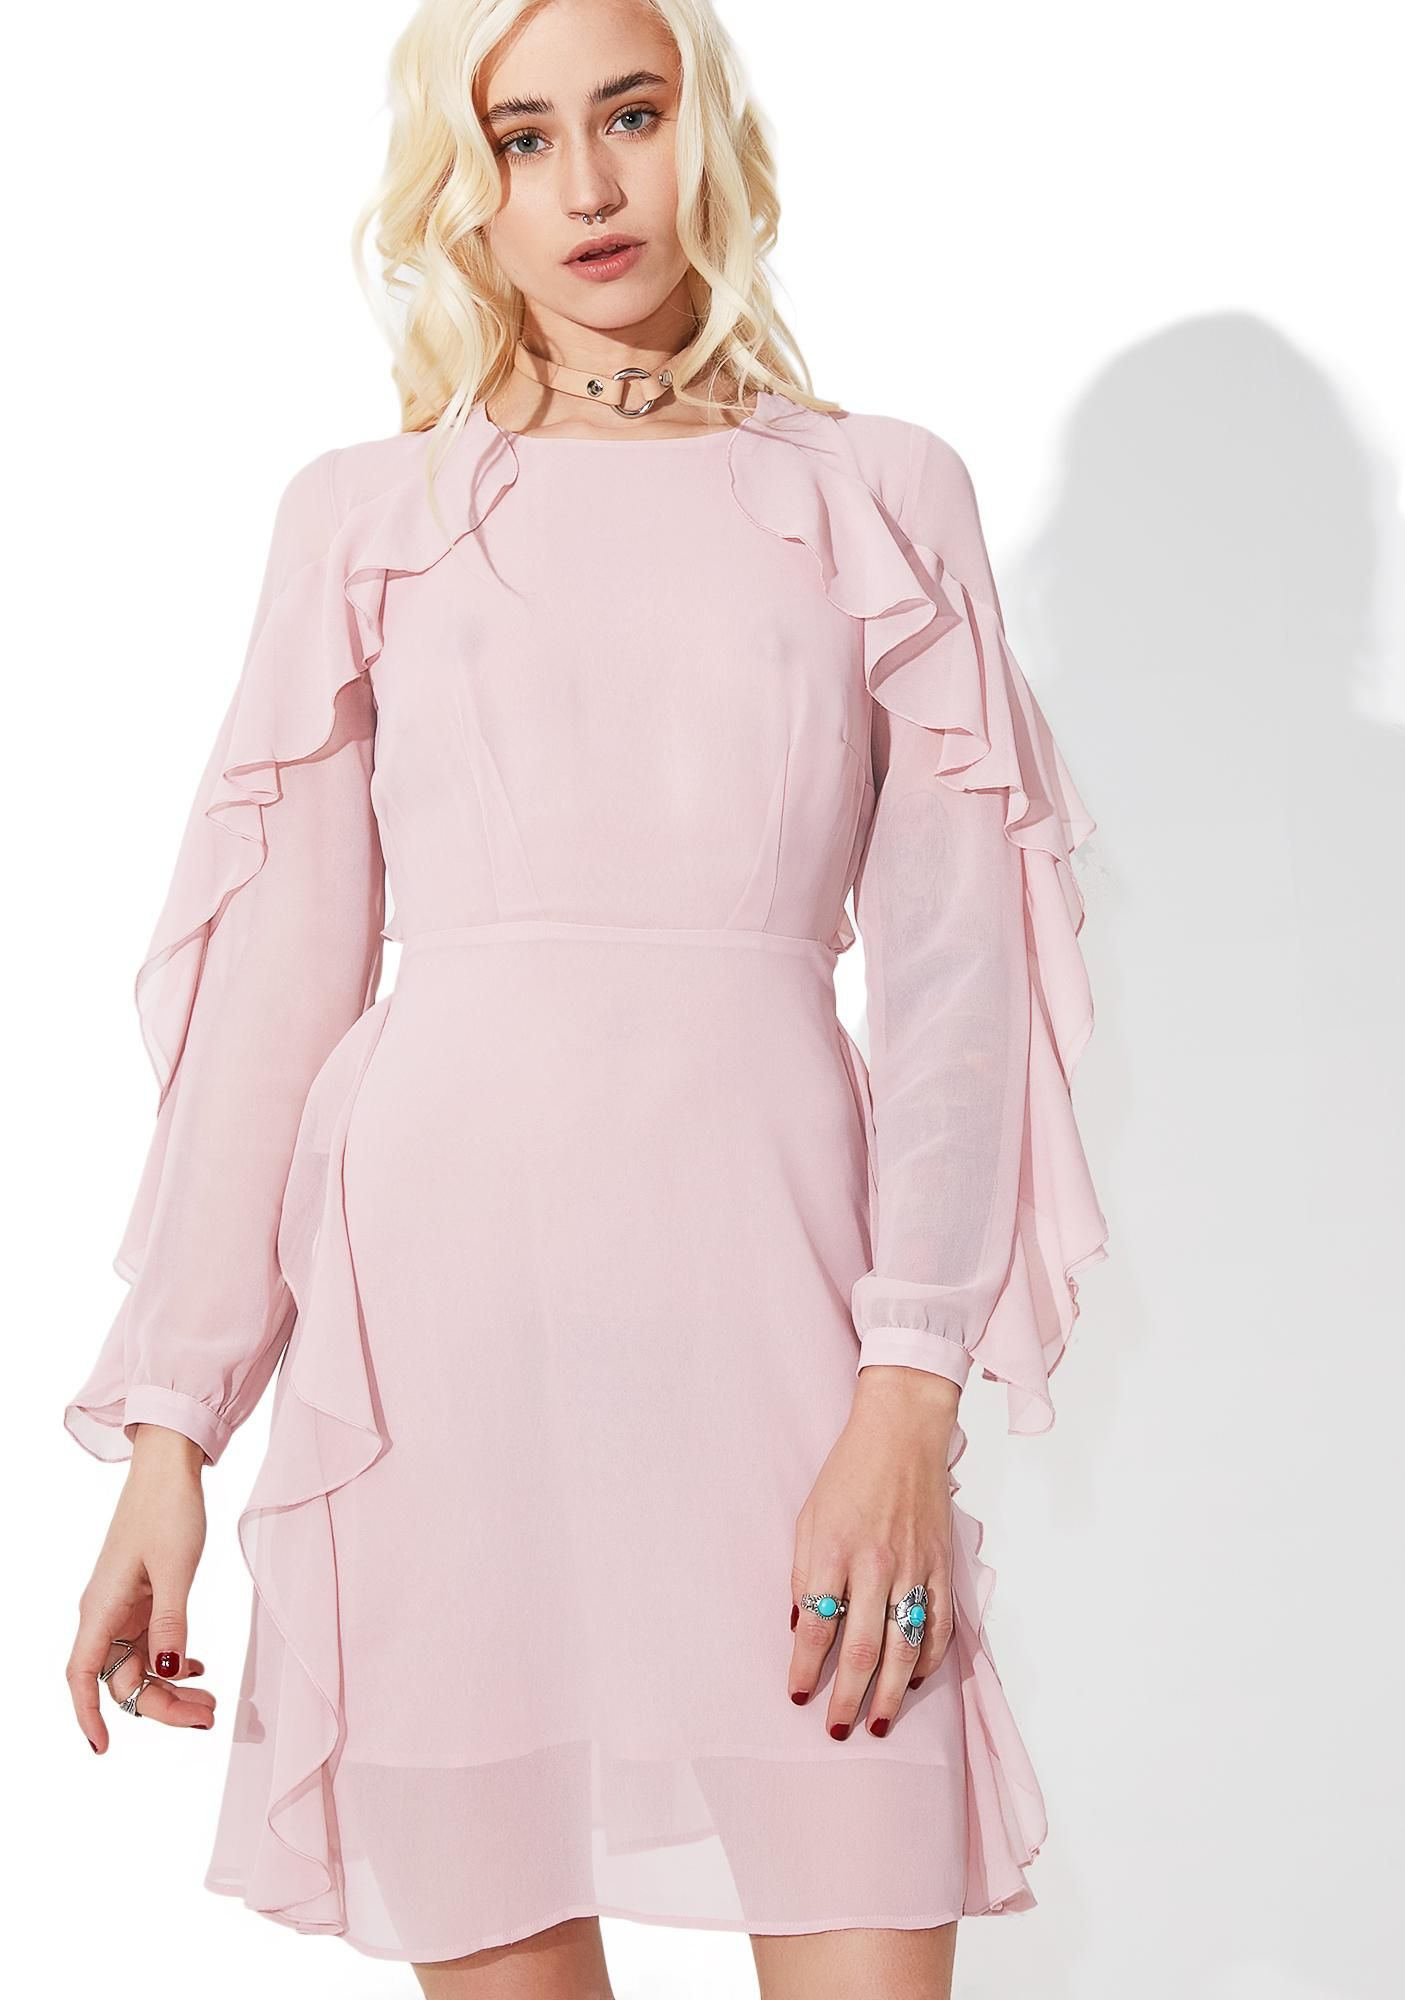 From Above Ruffled Mini Dress Mini Dress Dresses Long Sleeve Mini Dress [ 2000 x 1405 Pixel ]